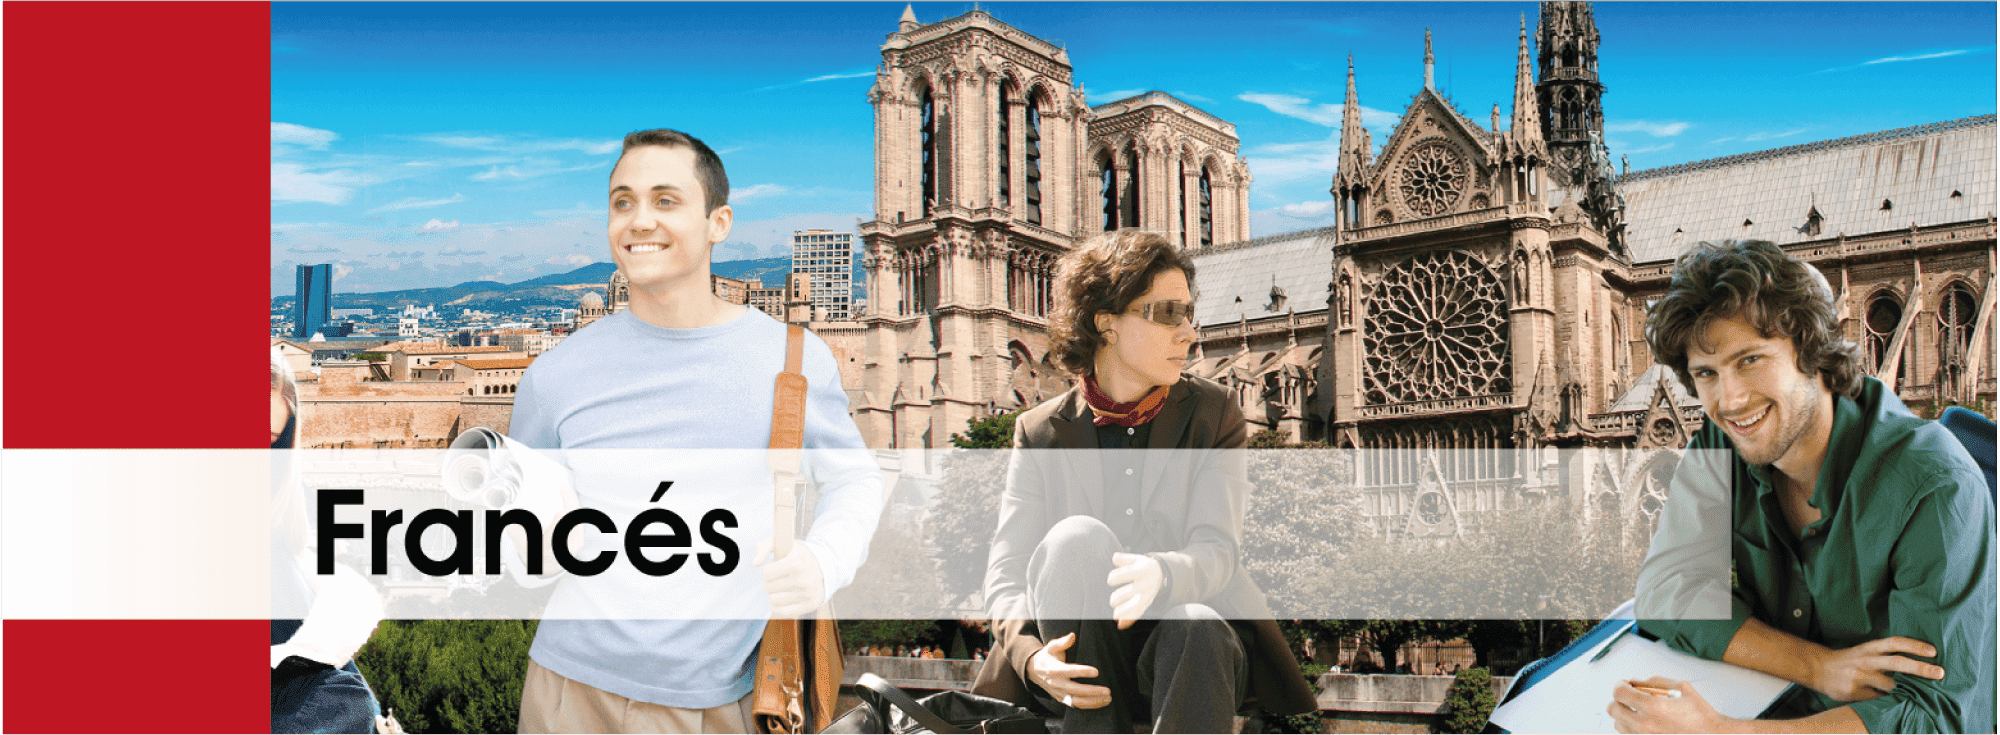 Curso Frances Presencial, Cursos Frances Online, Curso de Idiomas